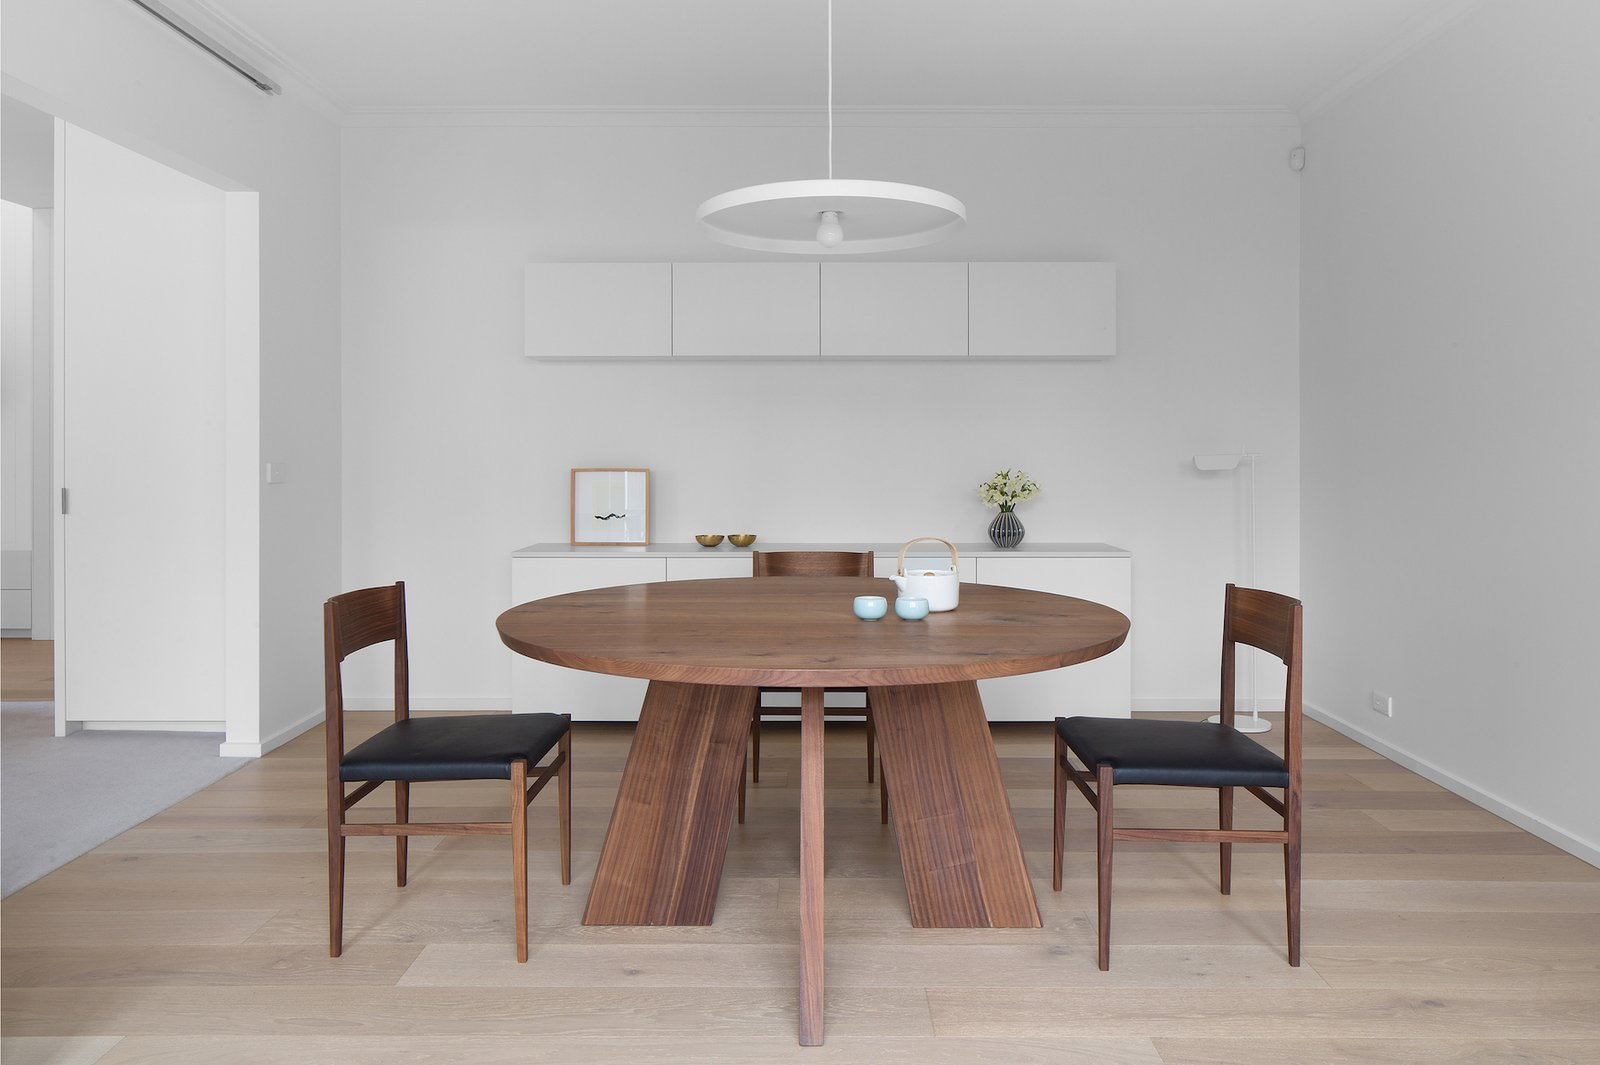 Tagged: Dining Room, Chair, Table, Pendant Lighting, and Light Hardwood Floor.  Corhampton Rd Residence by Leibal